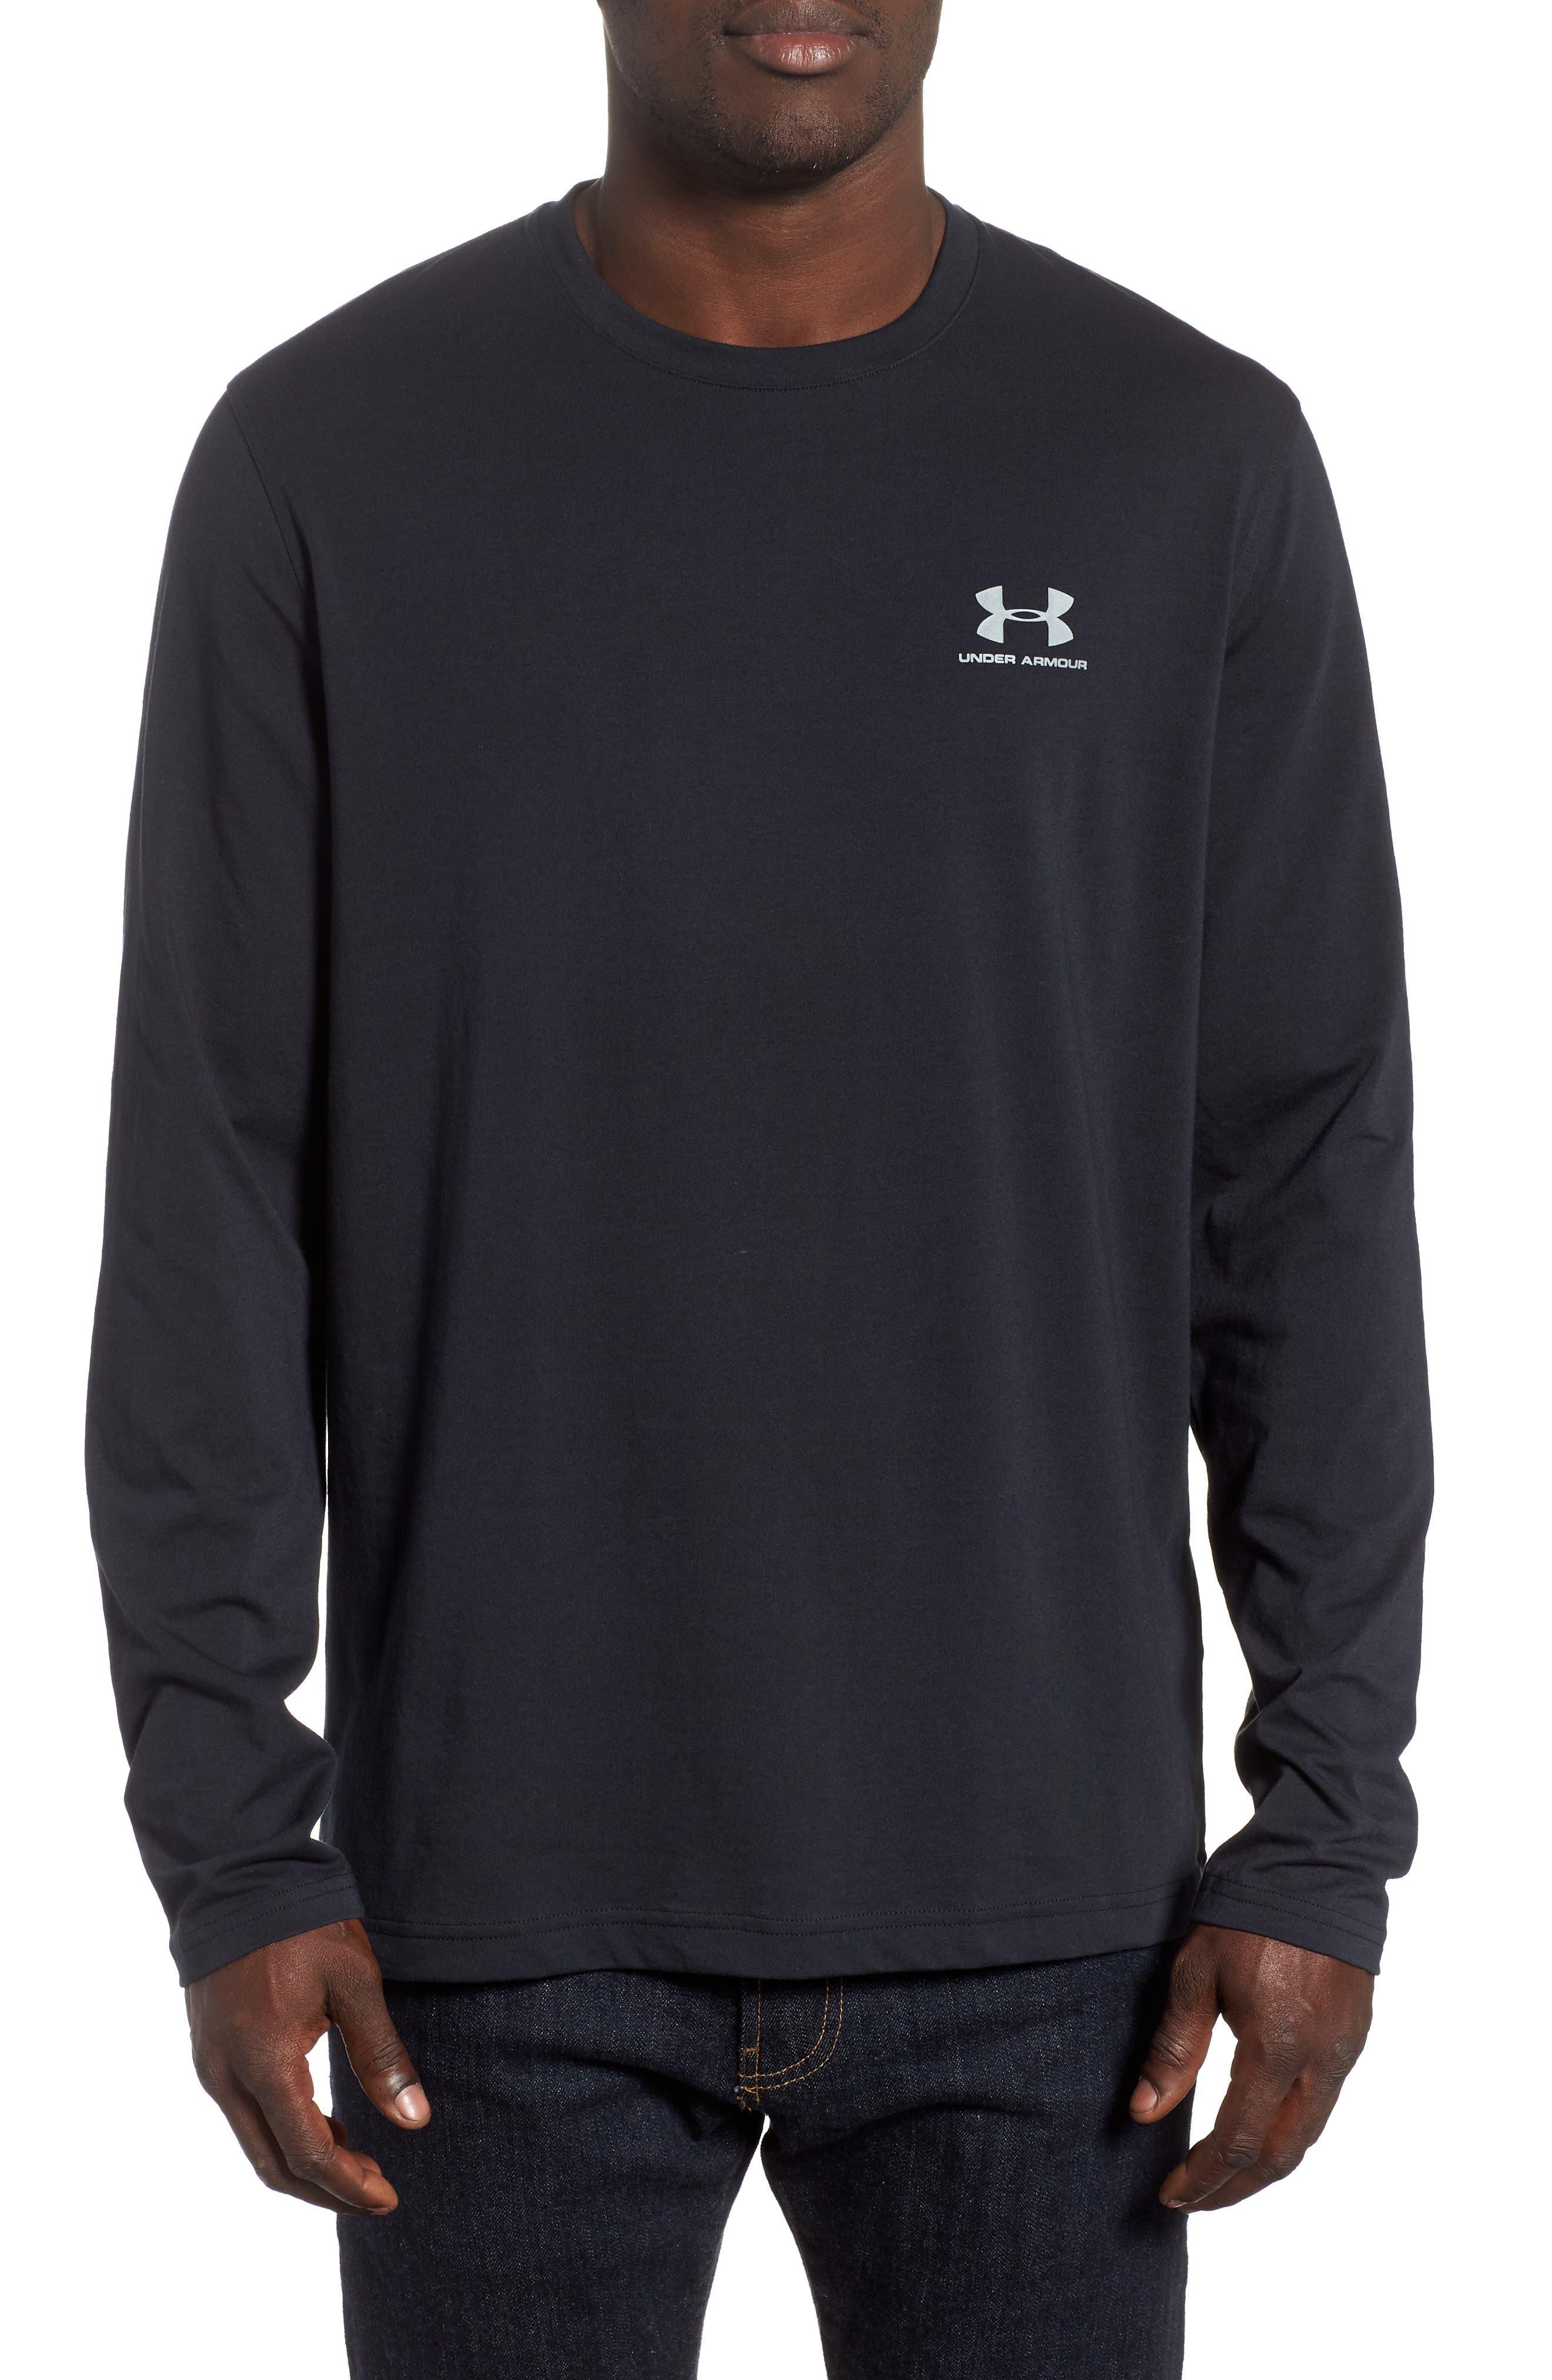 HeatGear<sup>®</sup> Long Sleeve Performance T-Shirt,                             Main thumbnail 1, color,                             BLACK/ STEEL